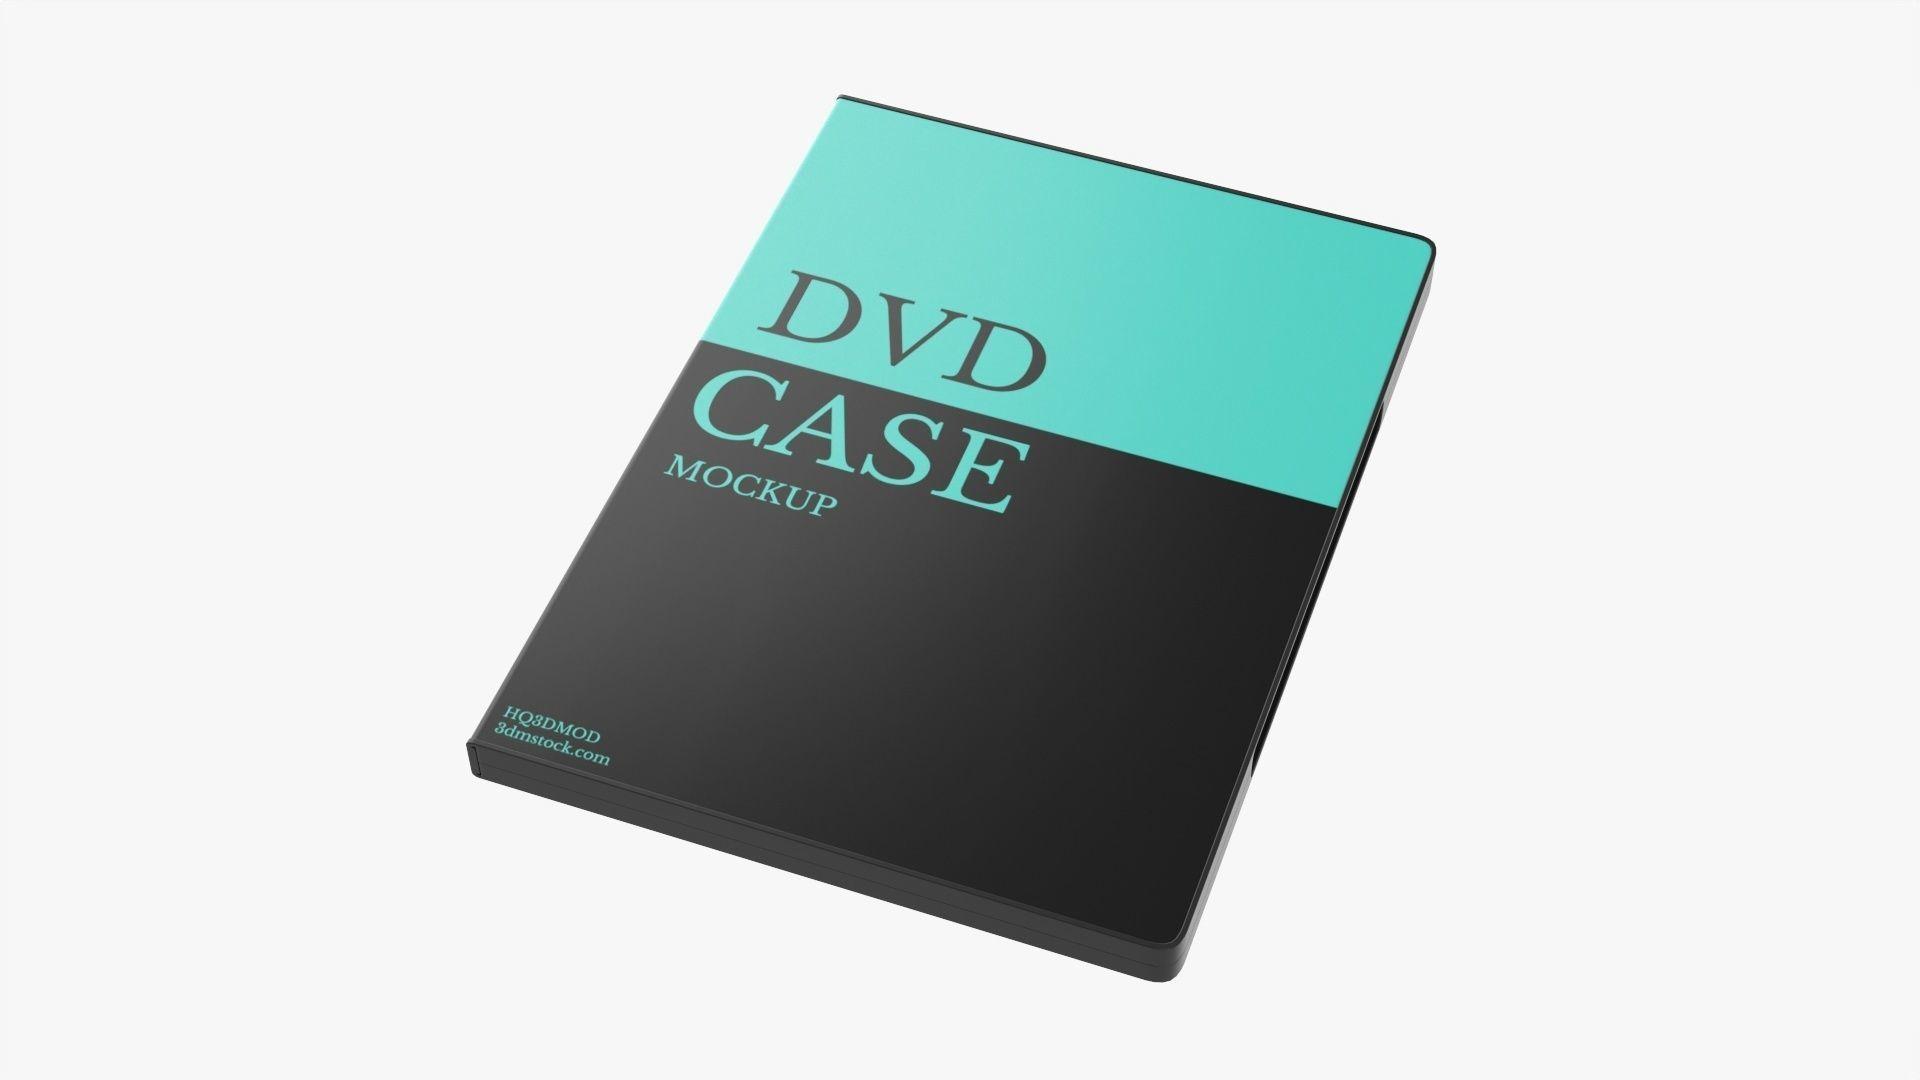 Closed DVD case mockup